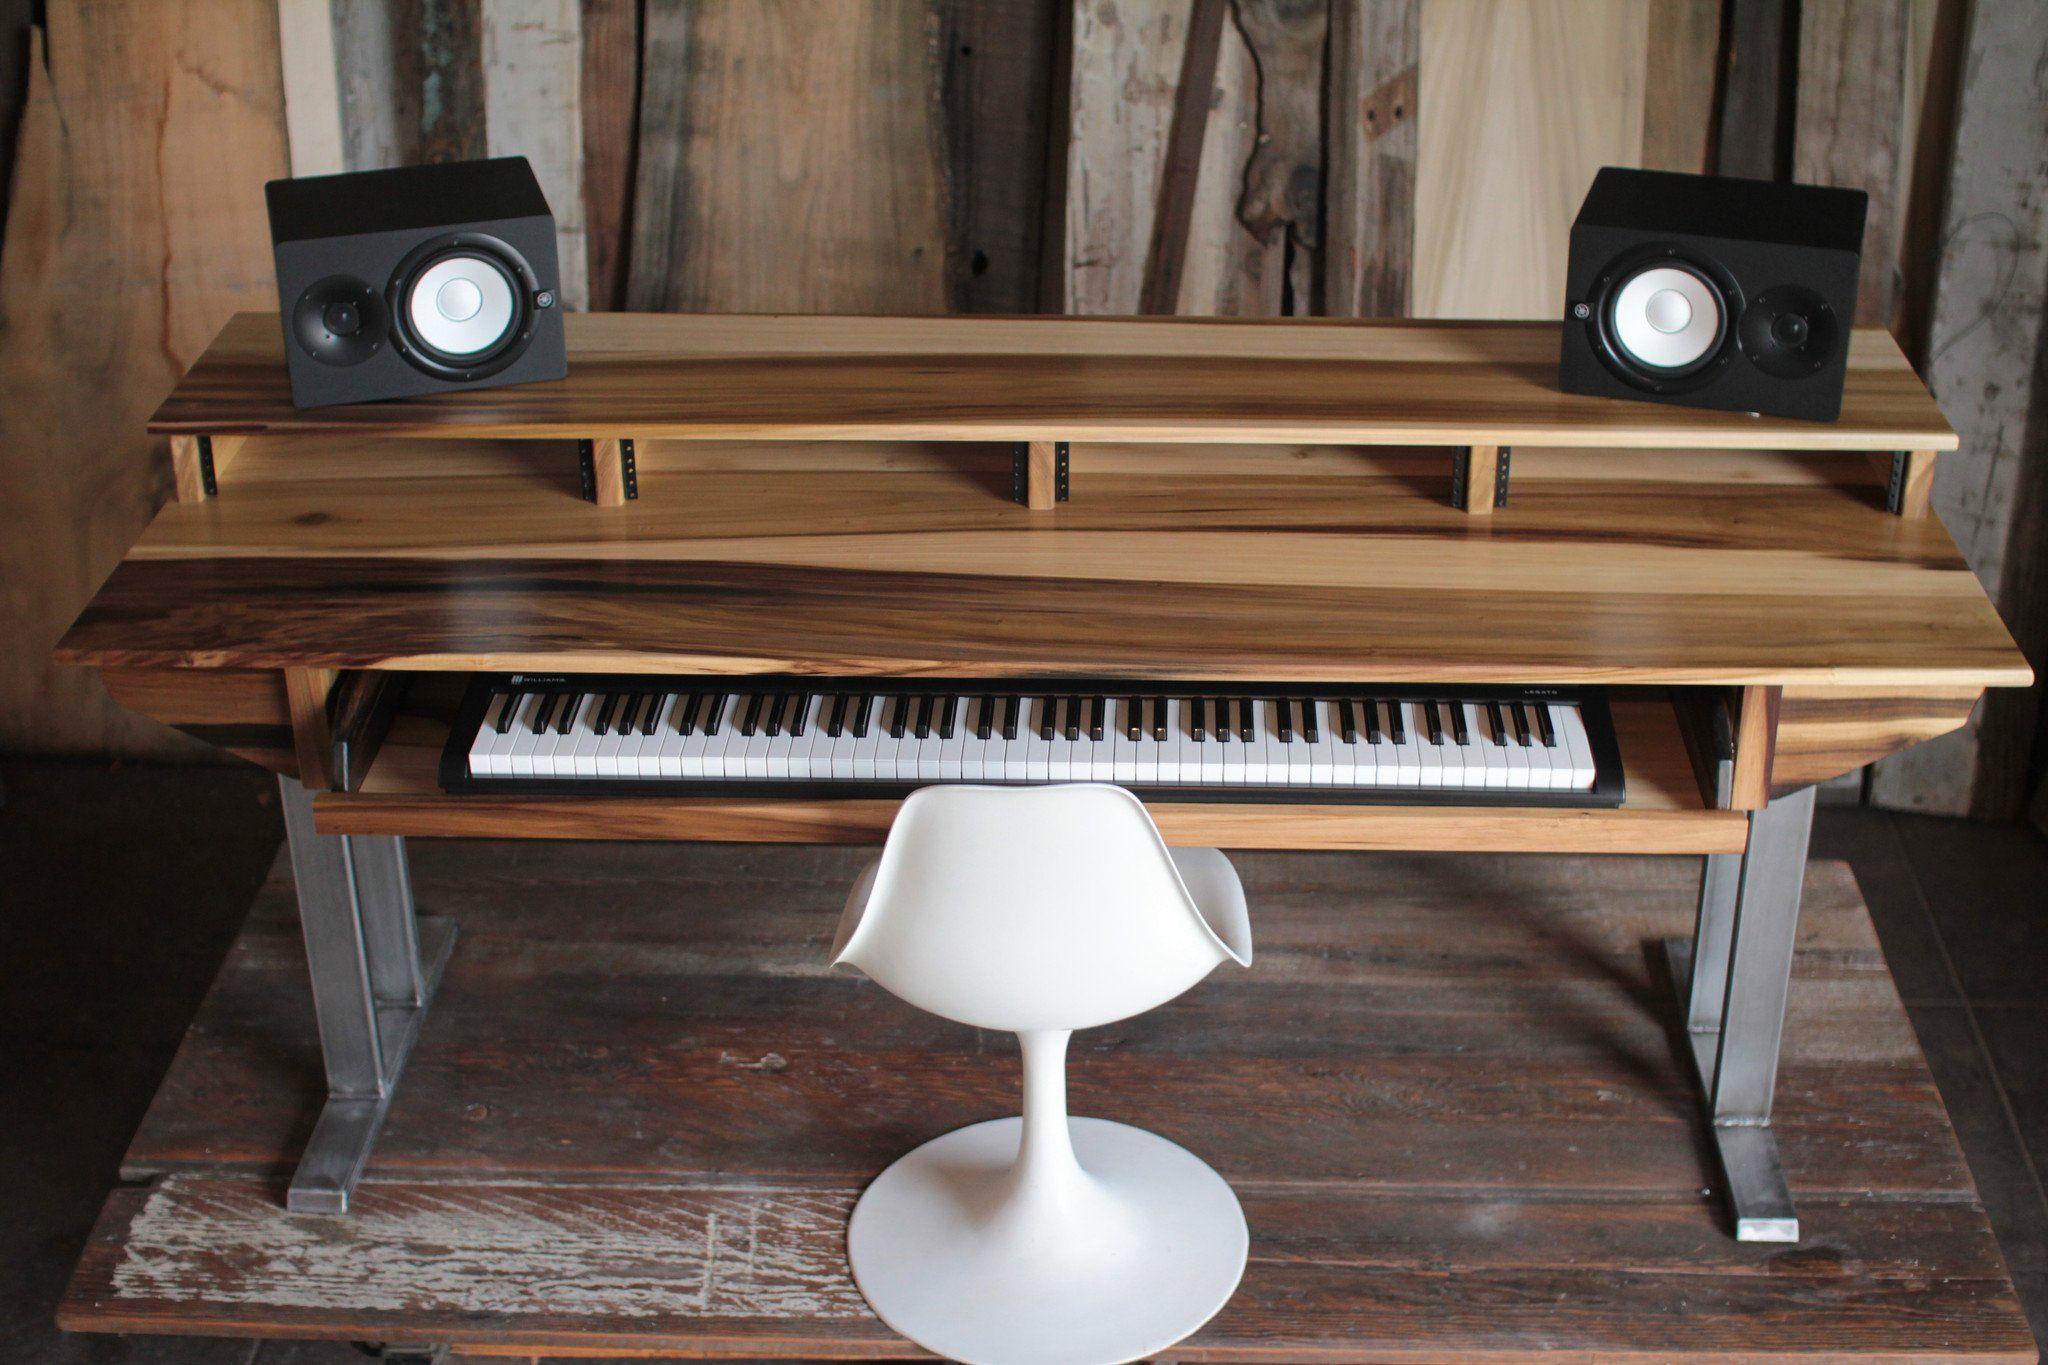 full size 88key studio desk for audio video music film production in 2019 music magic. Black Bedroom Furniture Sets. Home Design Ideas